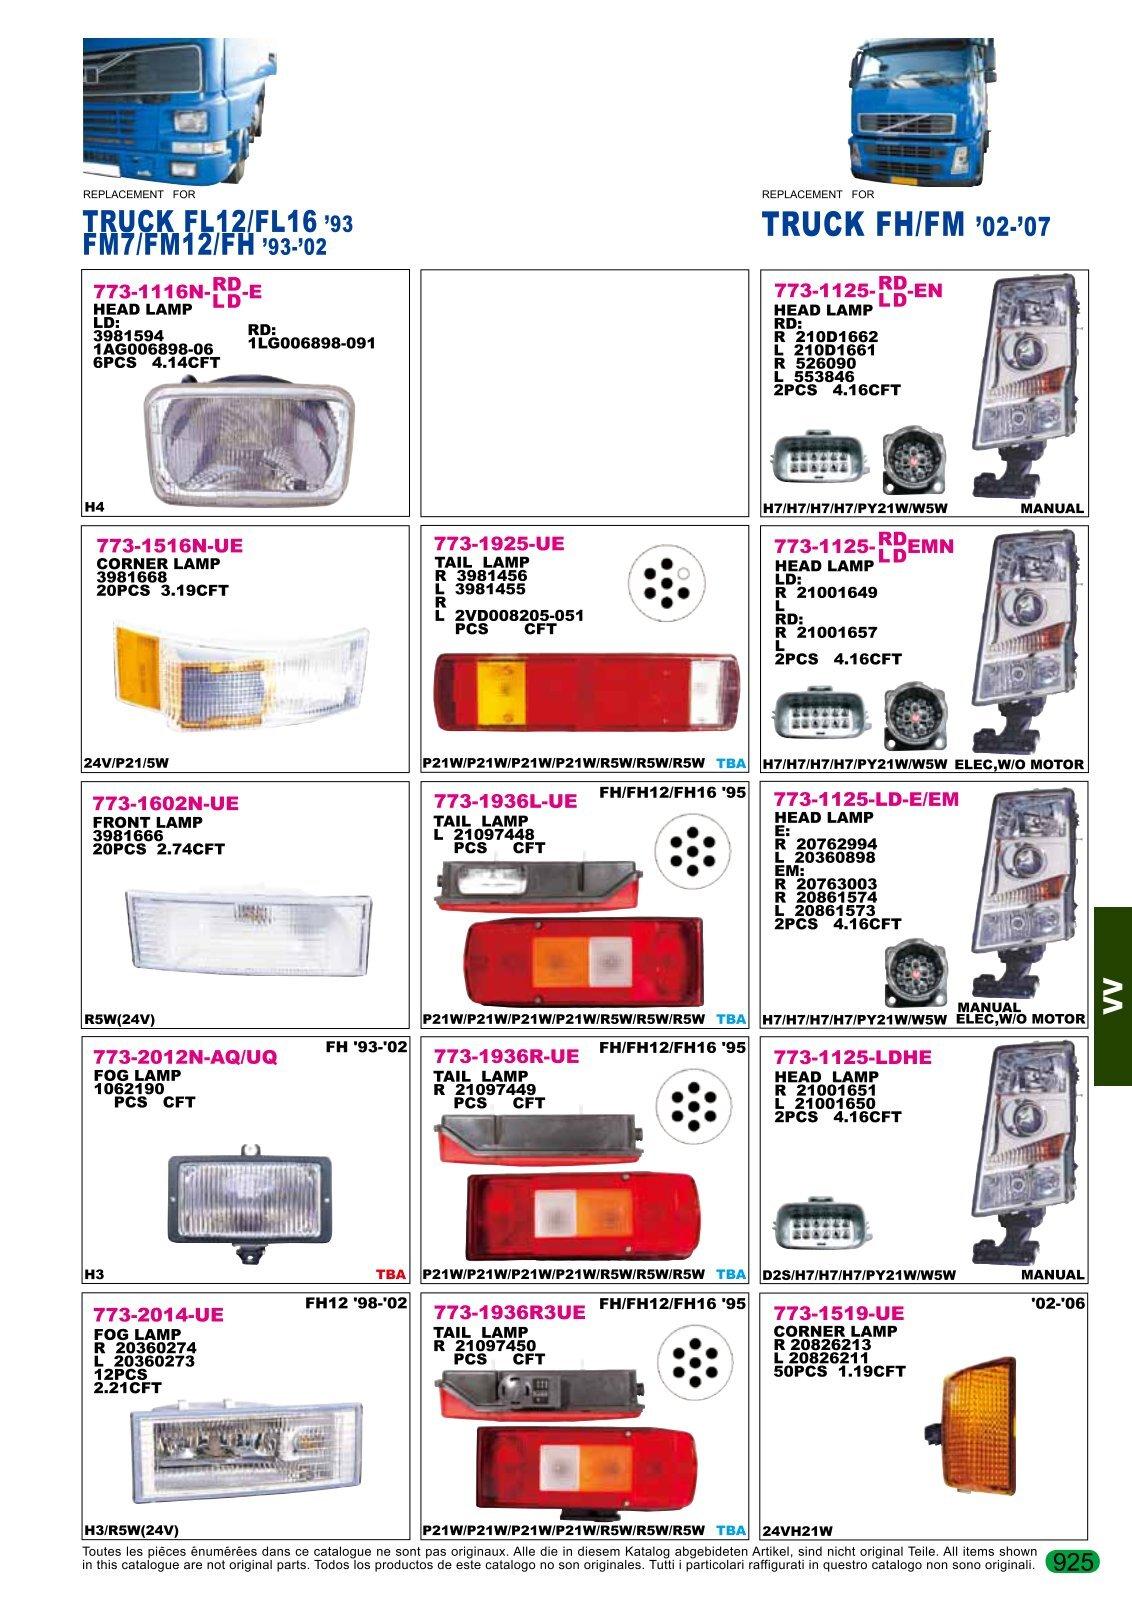 TRUCK FH/FM '02-'07 - AutoBodyParts.gr